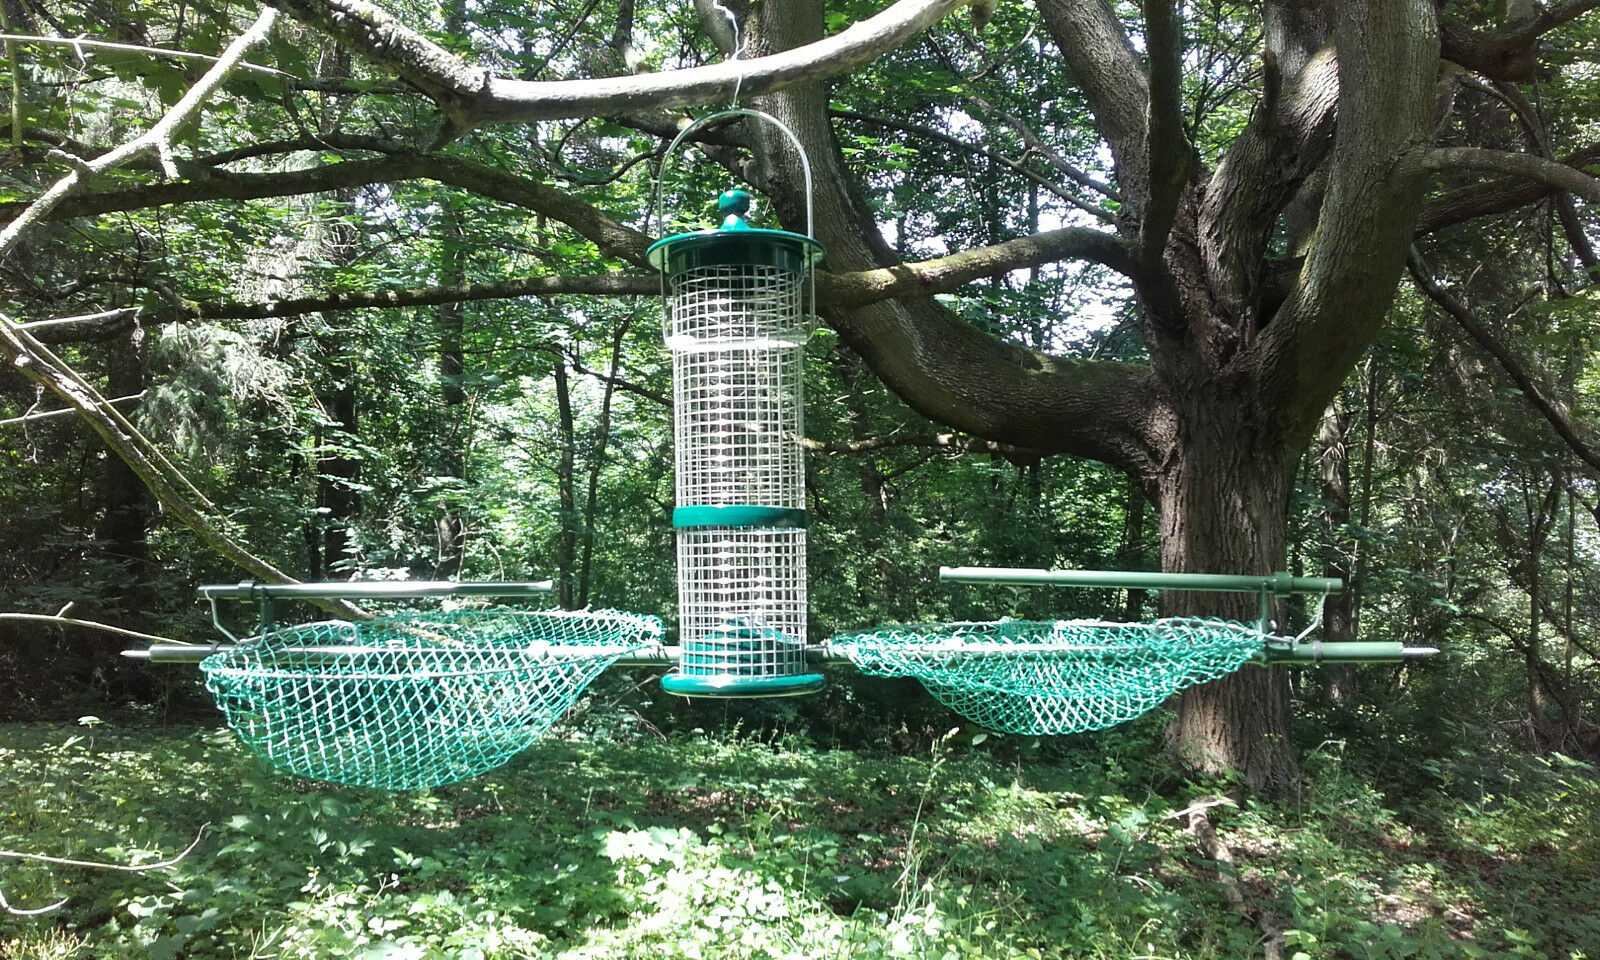 Kombi Vogelfalle Trappola Uccelli Piege Oiseaux Bird Trap Trampa Pajaros ALU